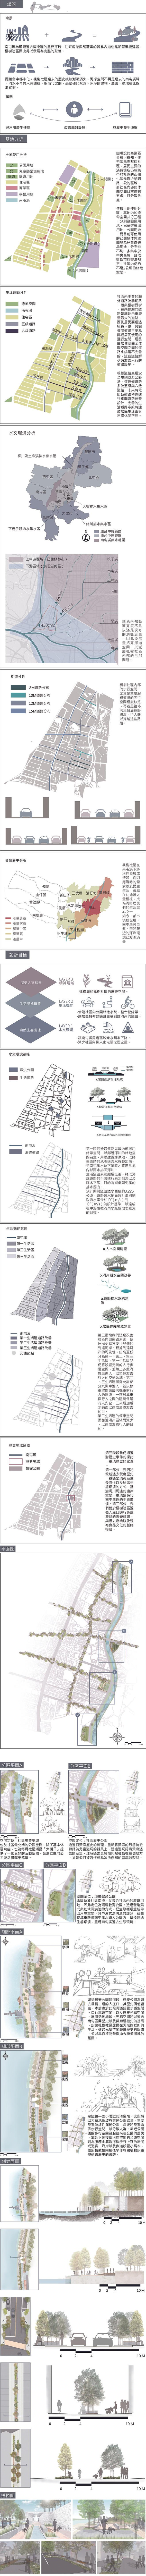 CONNECTING RIVER—以台中楓樹社區為例-作品內容.jpg